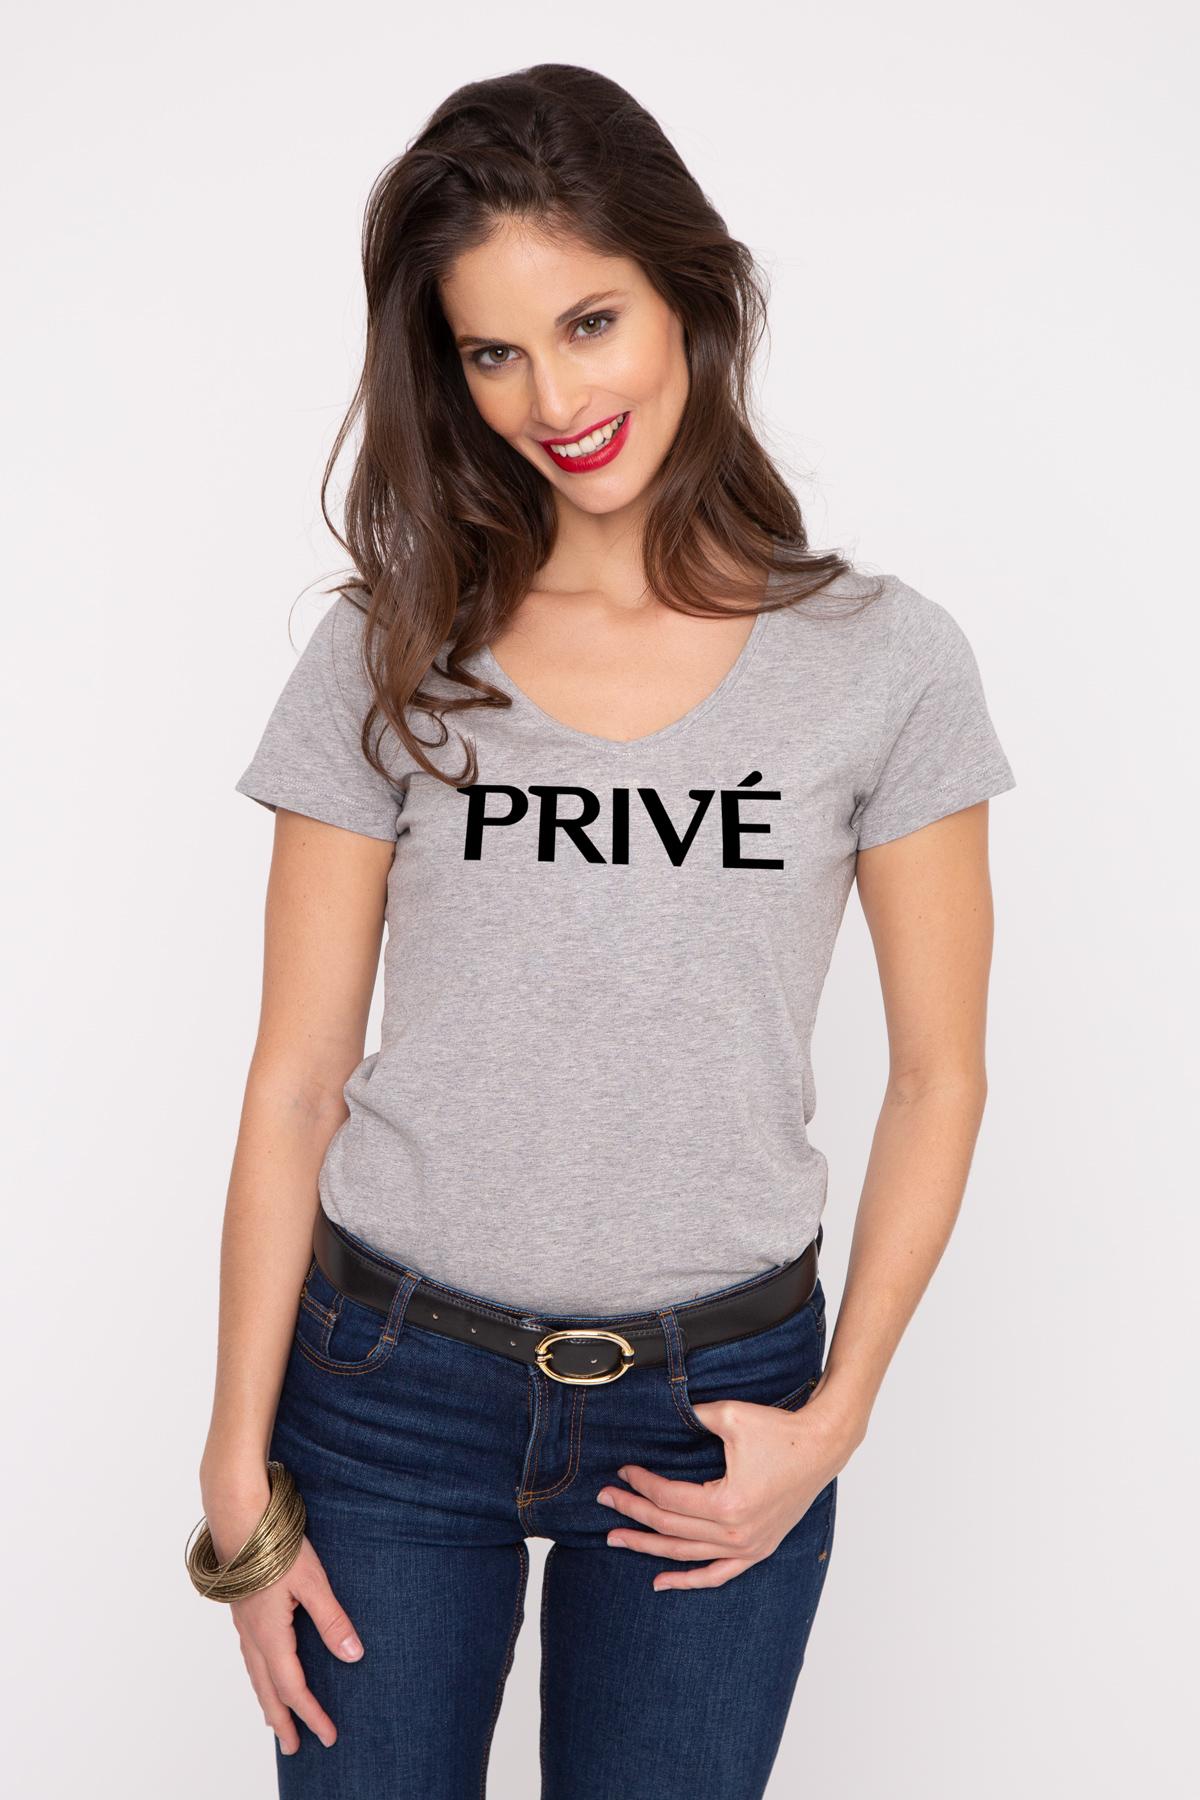 Photo de T-SHIRTS COL V Tshirt col V PRIVE chez French Disorder